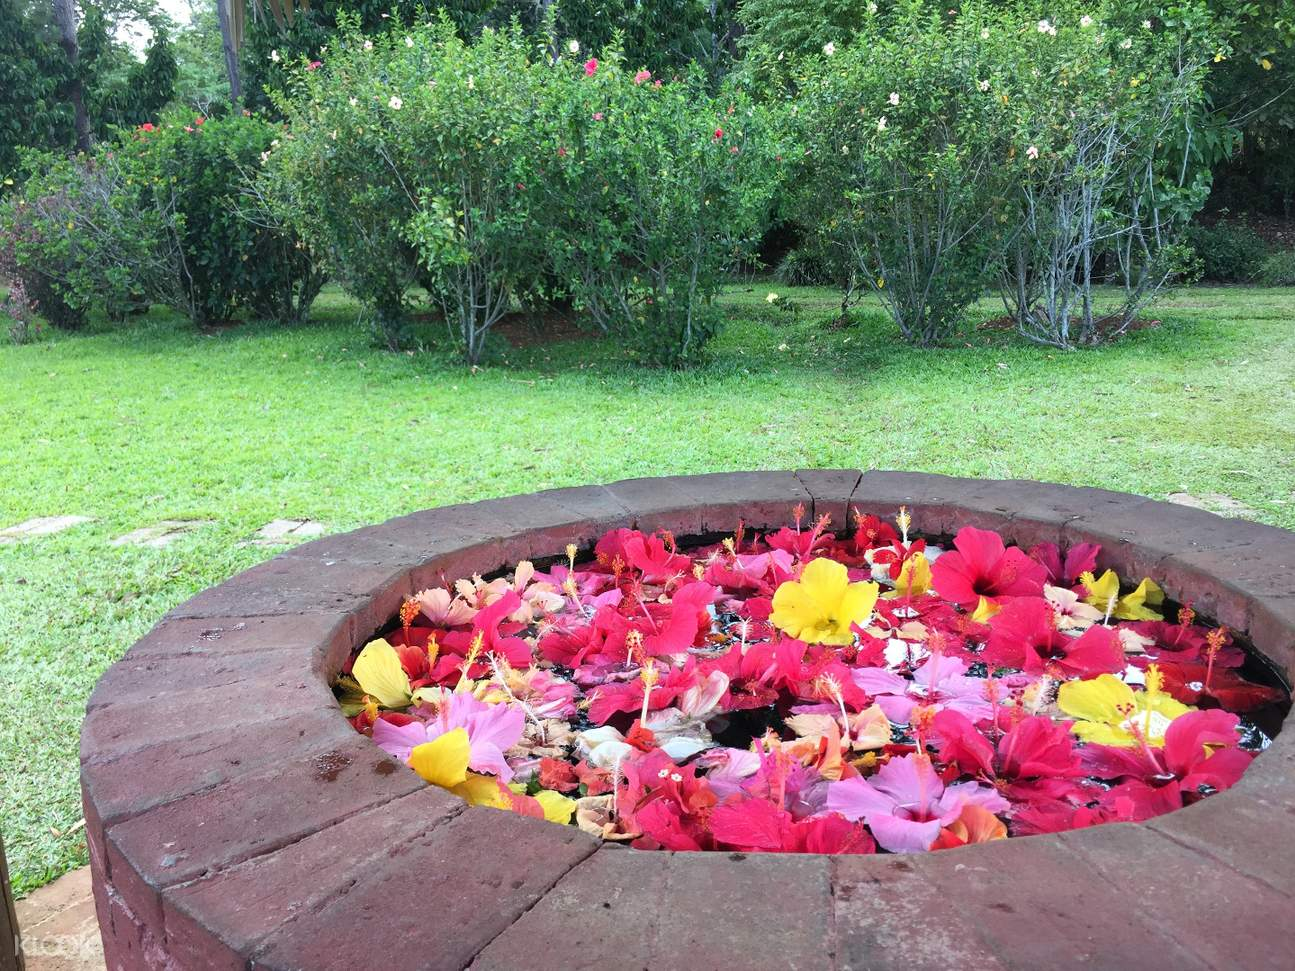 pit full of flowers